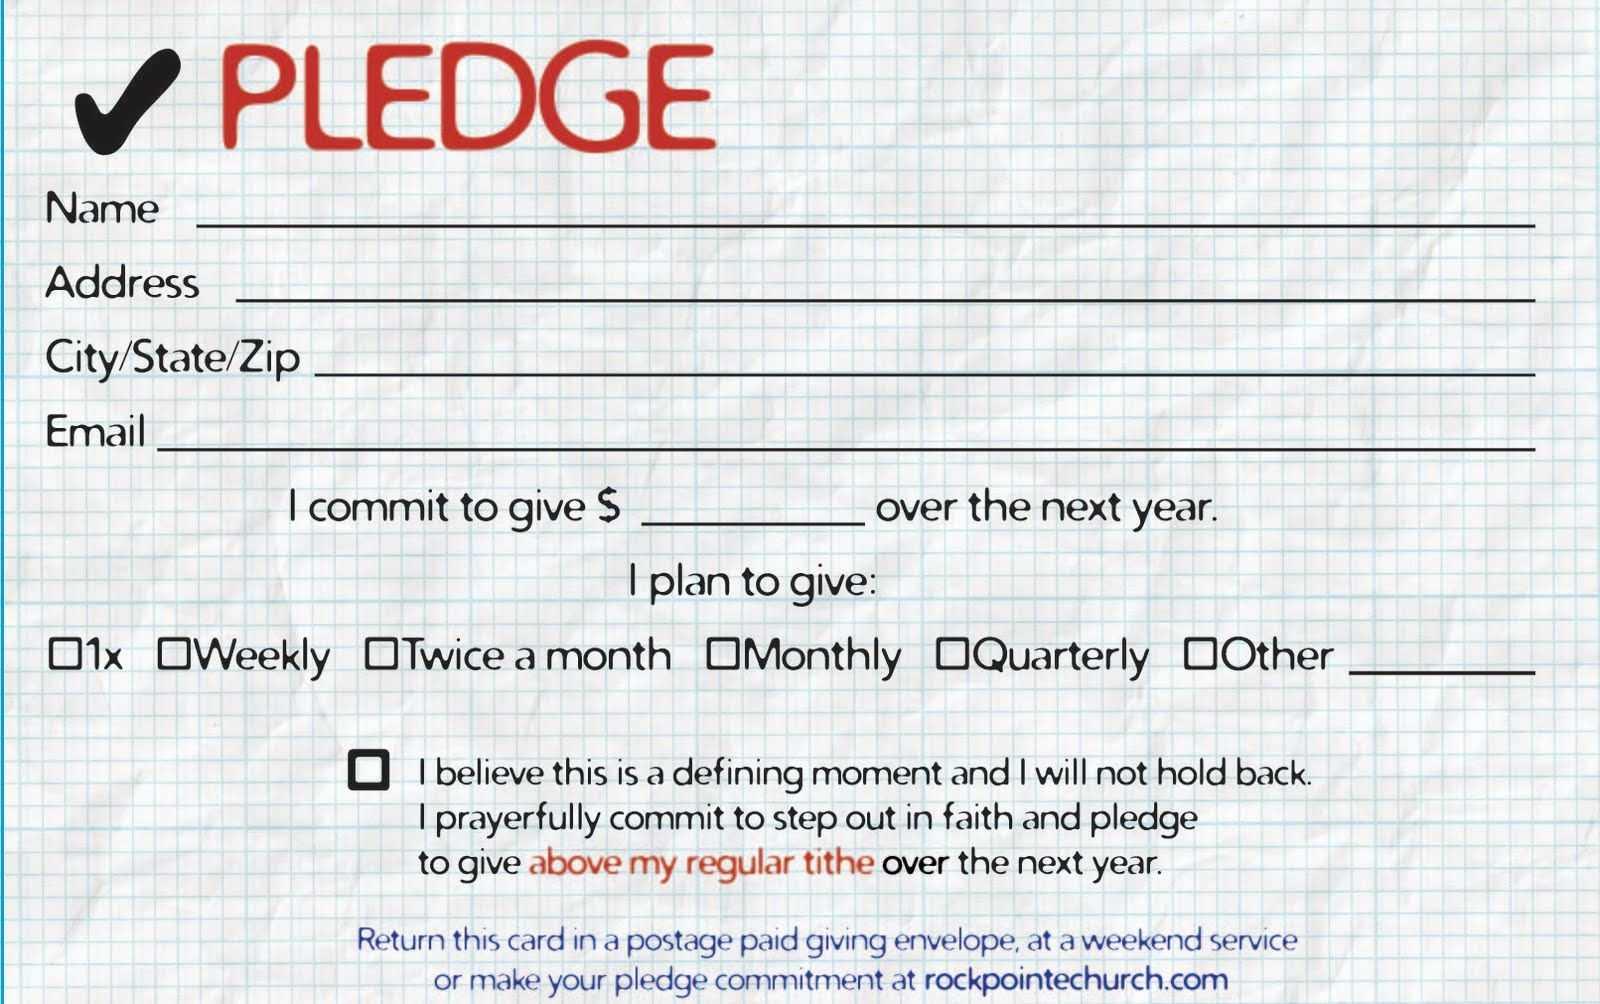 Pledge Cards For Churches | Pledge Card Templates | My Stuff Regarding Pledge Card Template For Church